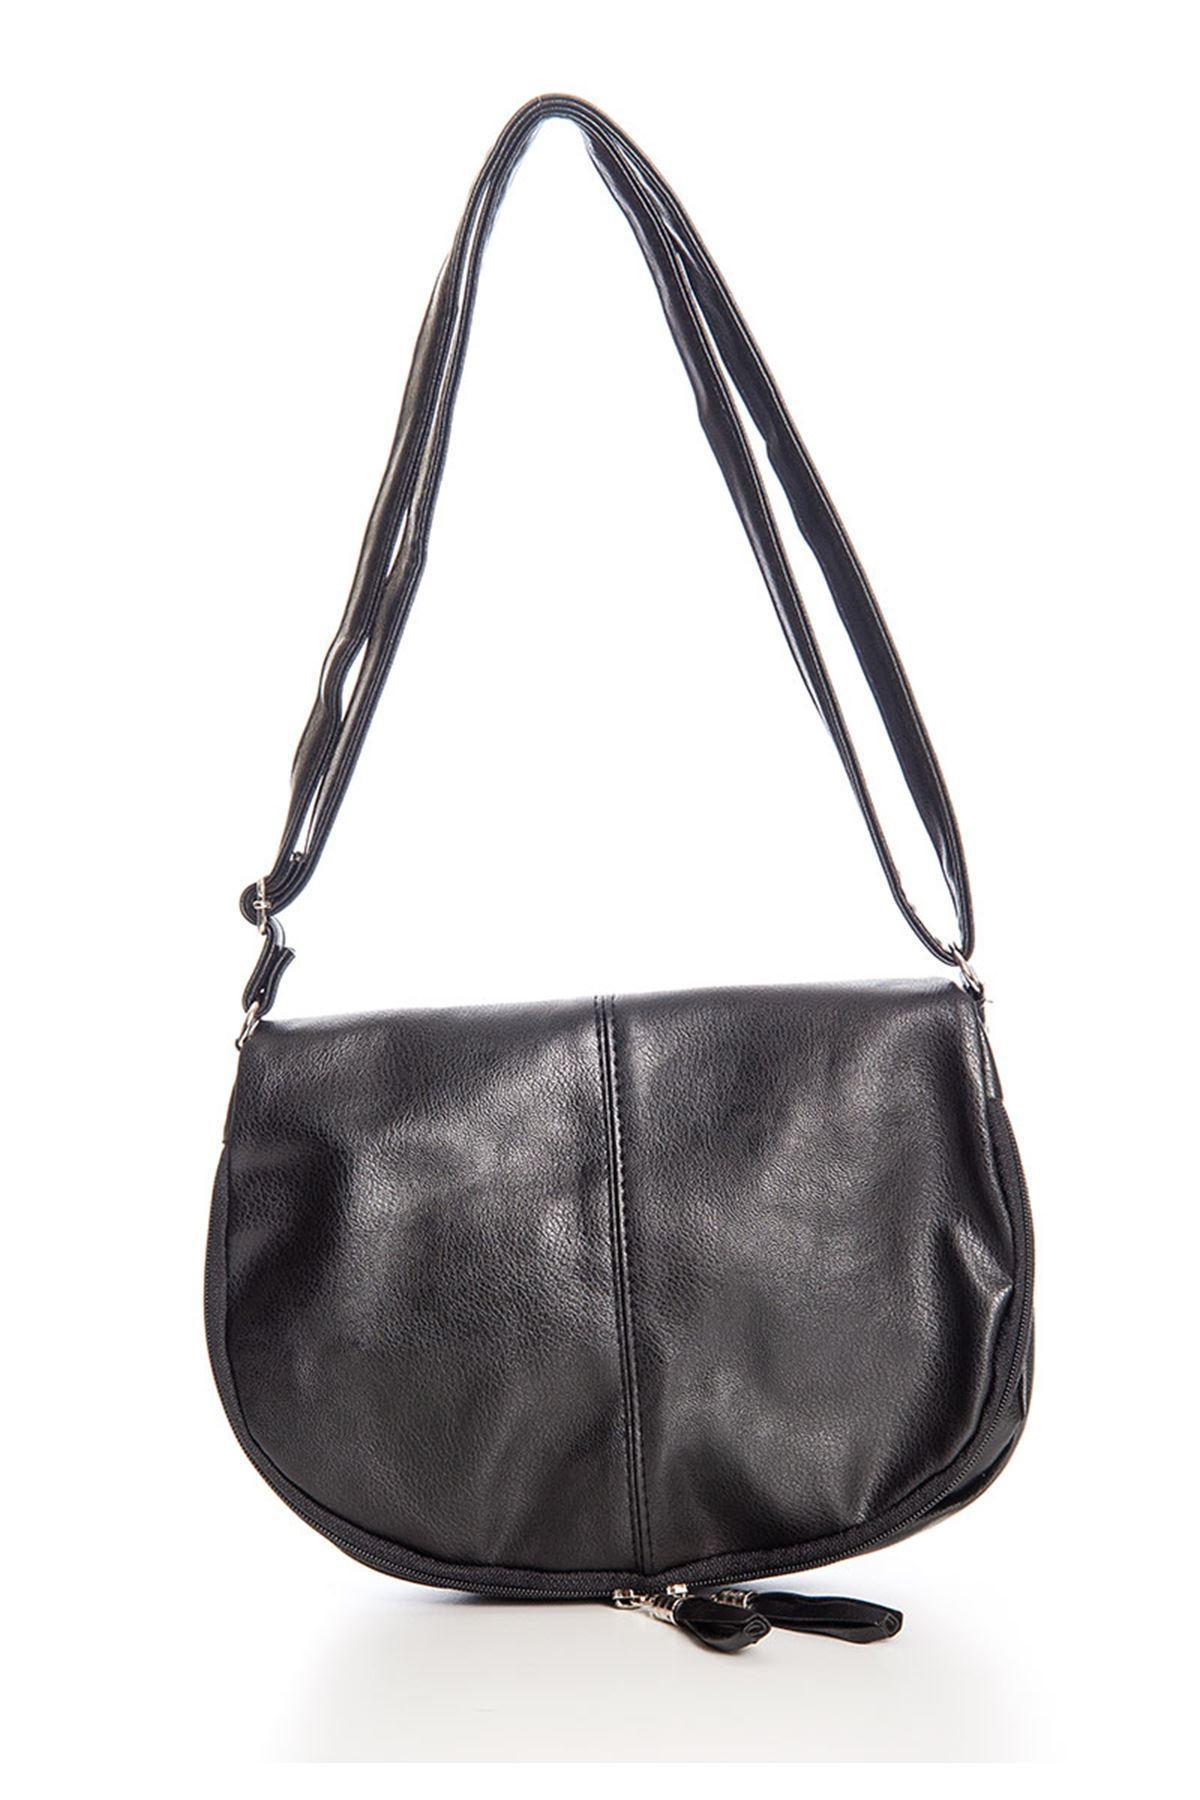 Siyah Kadın Çanta 16C 122607